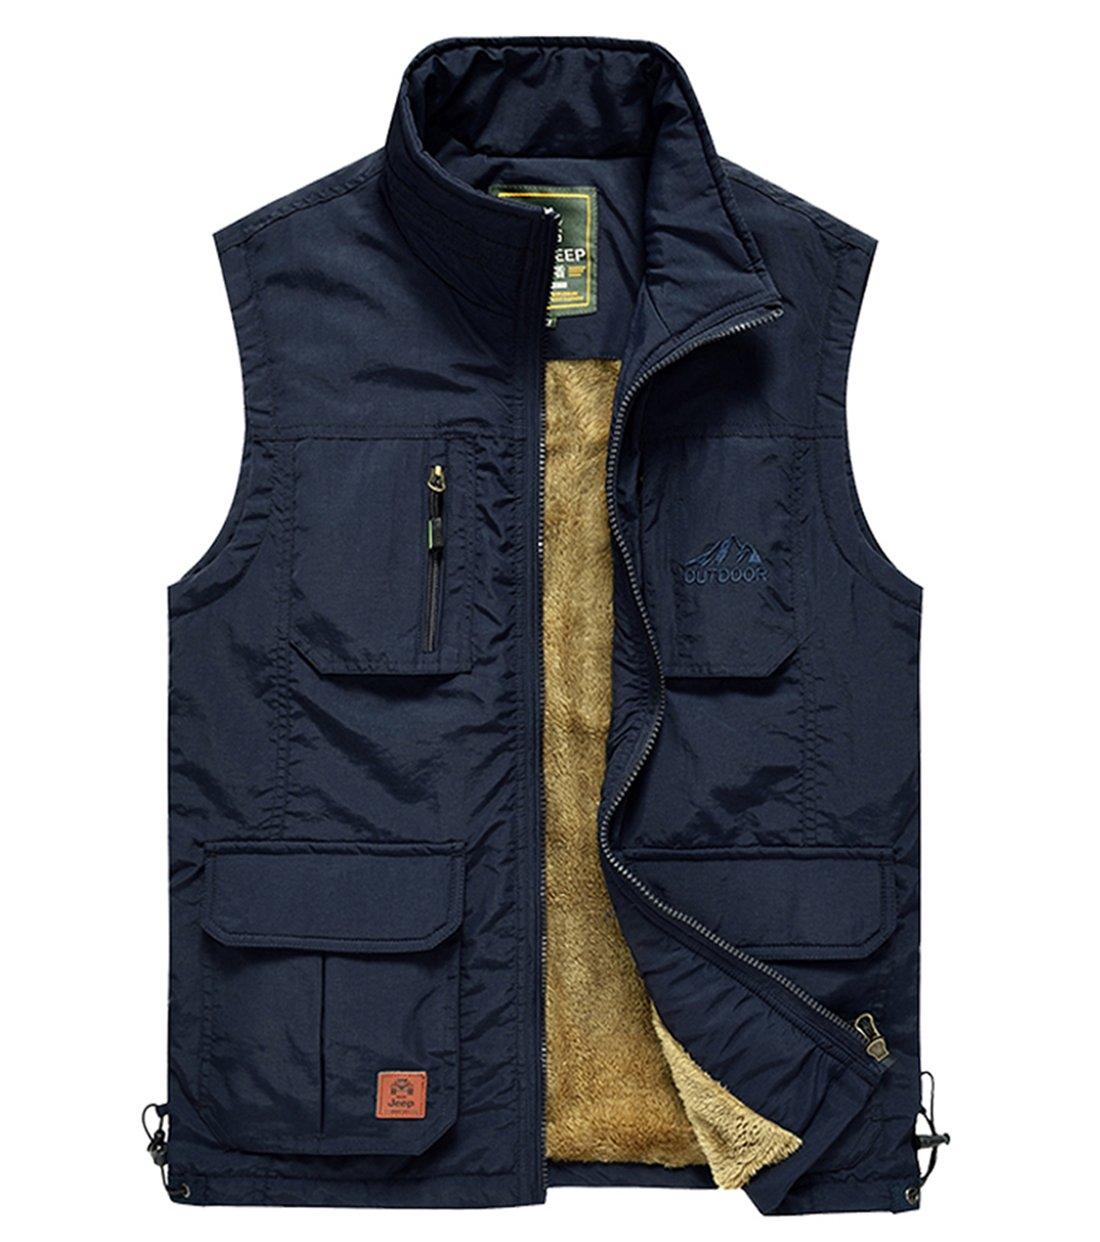 Men S Outdoor Multi Pockets Vest Jacket Outerwear Mountain